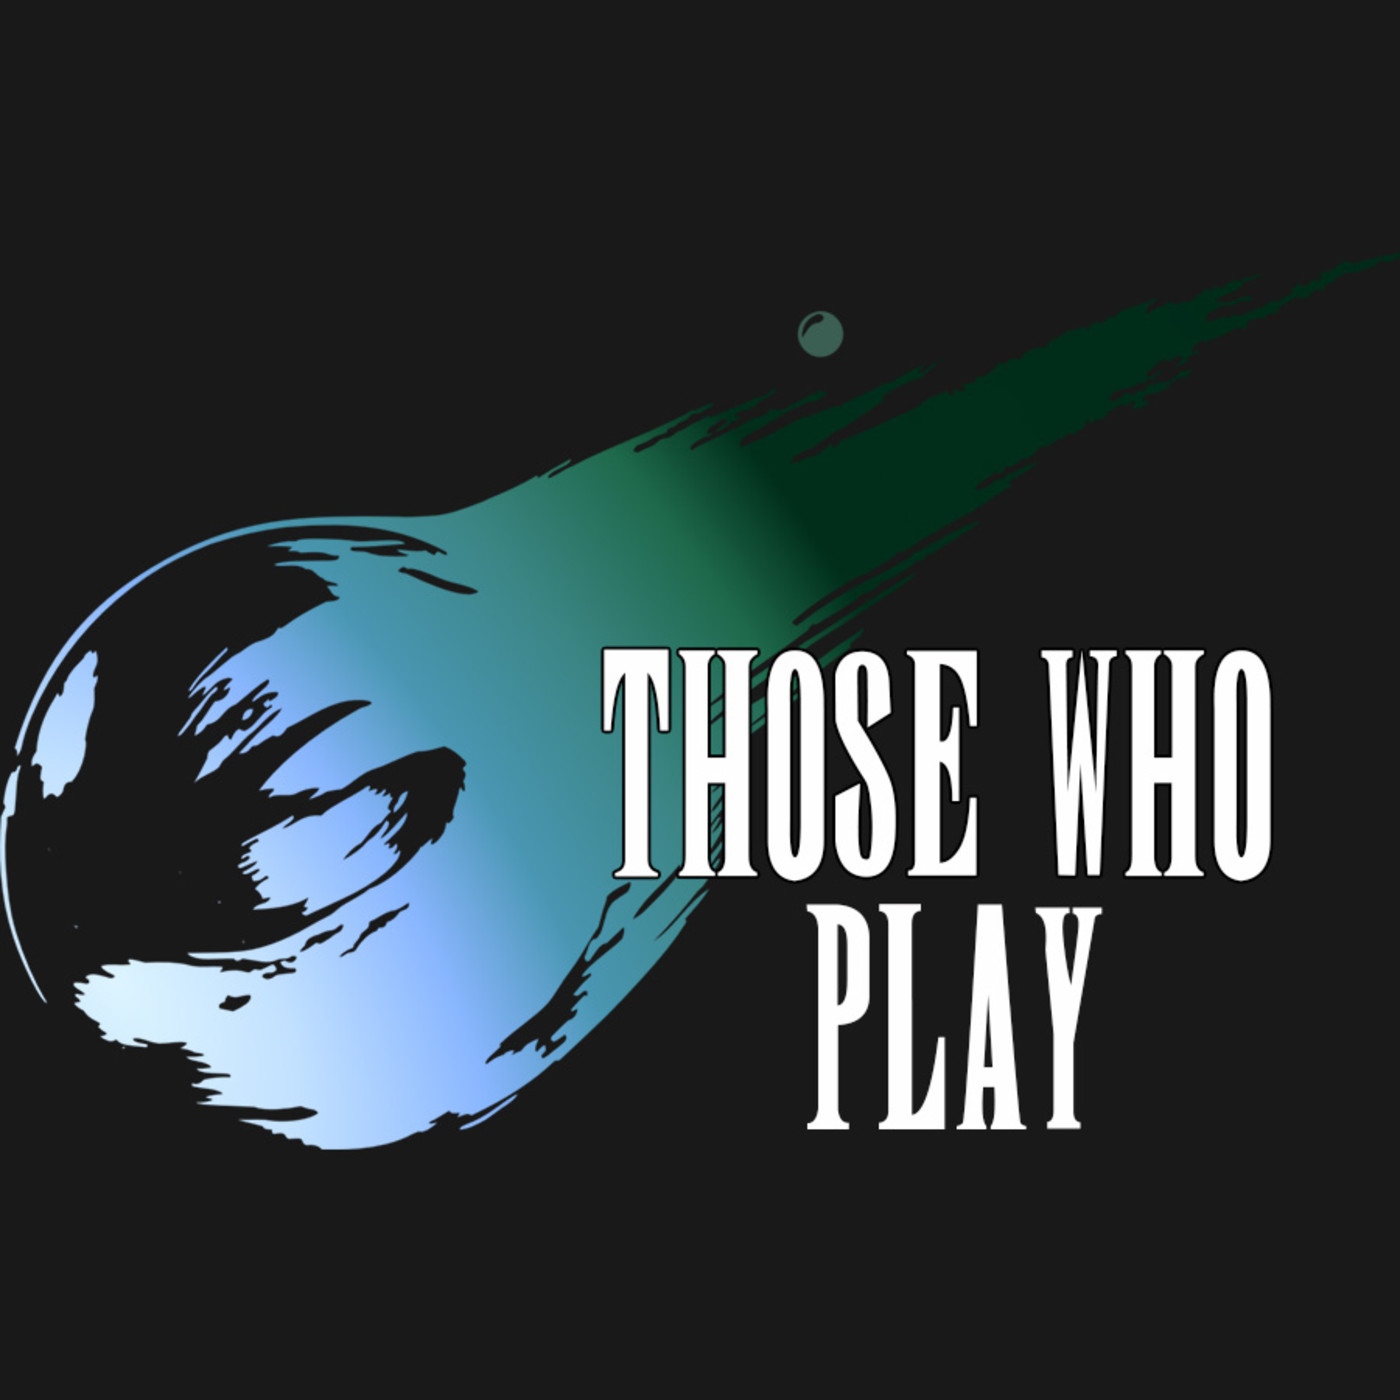 Those Who Play 3x01 [Inicia de temporada, PS5 showcase, Debate precio consolas next-gen]